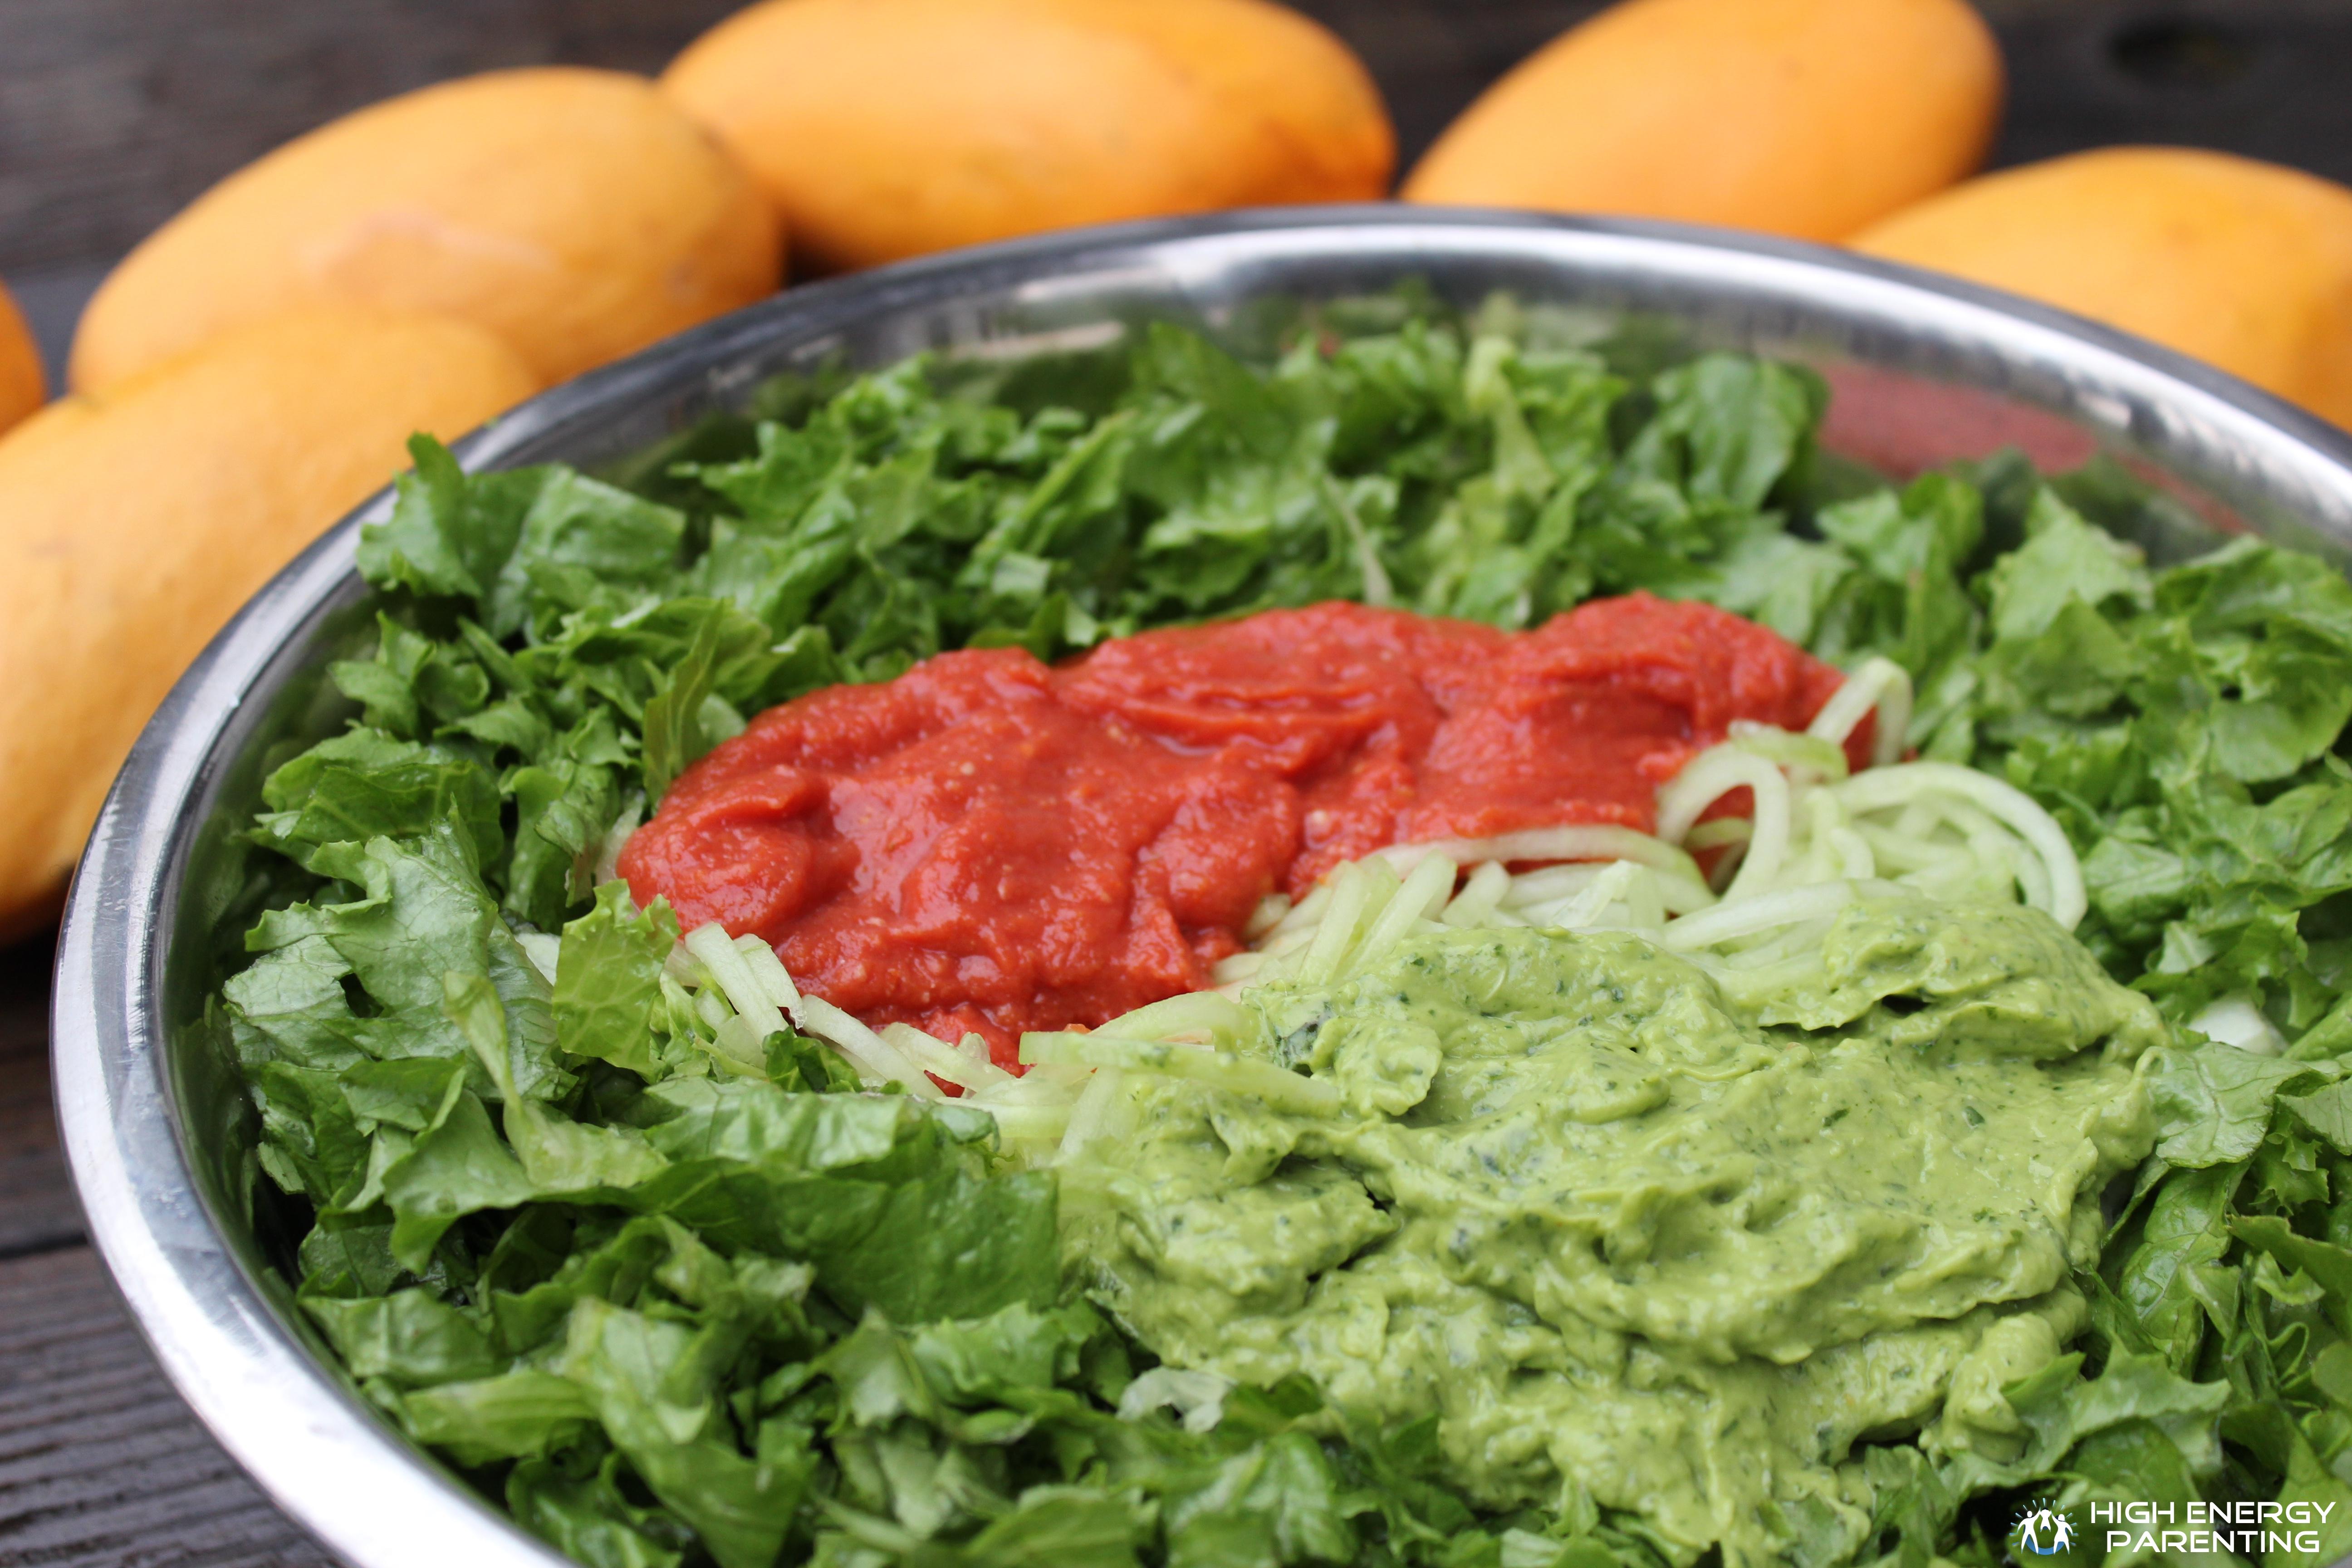 hep-raw-vegan-guacamole-salsa-salad-dressing